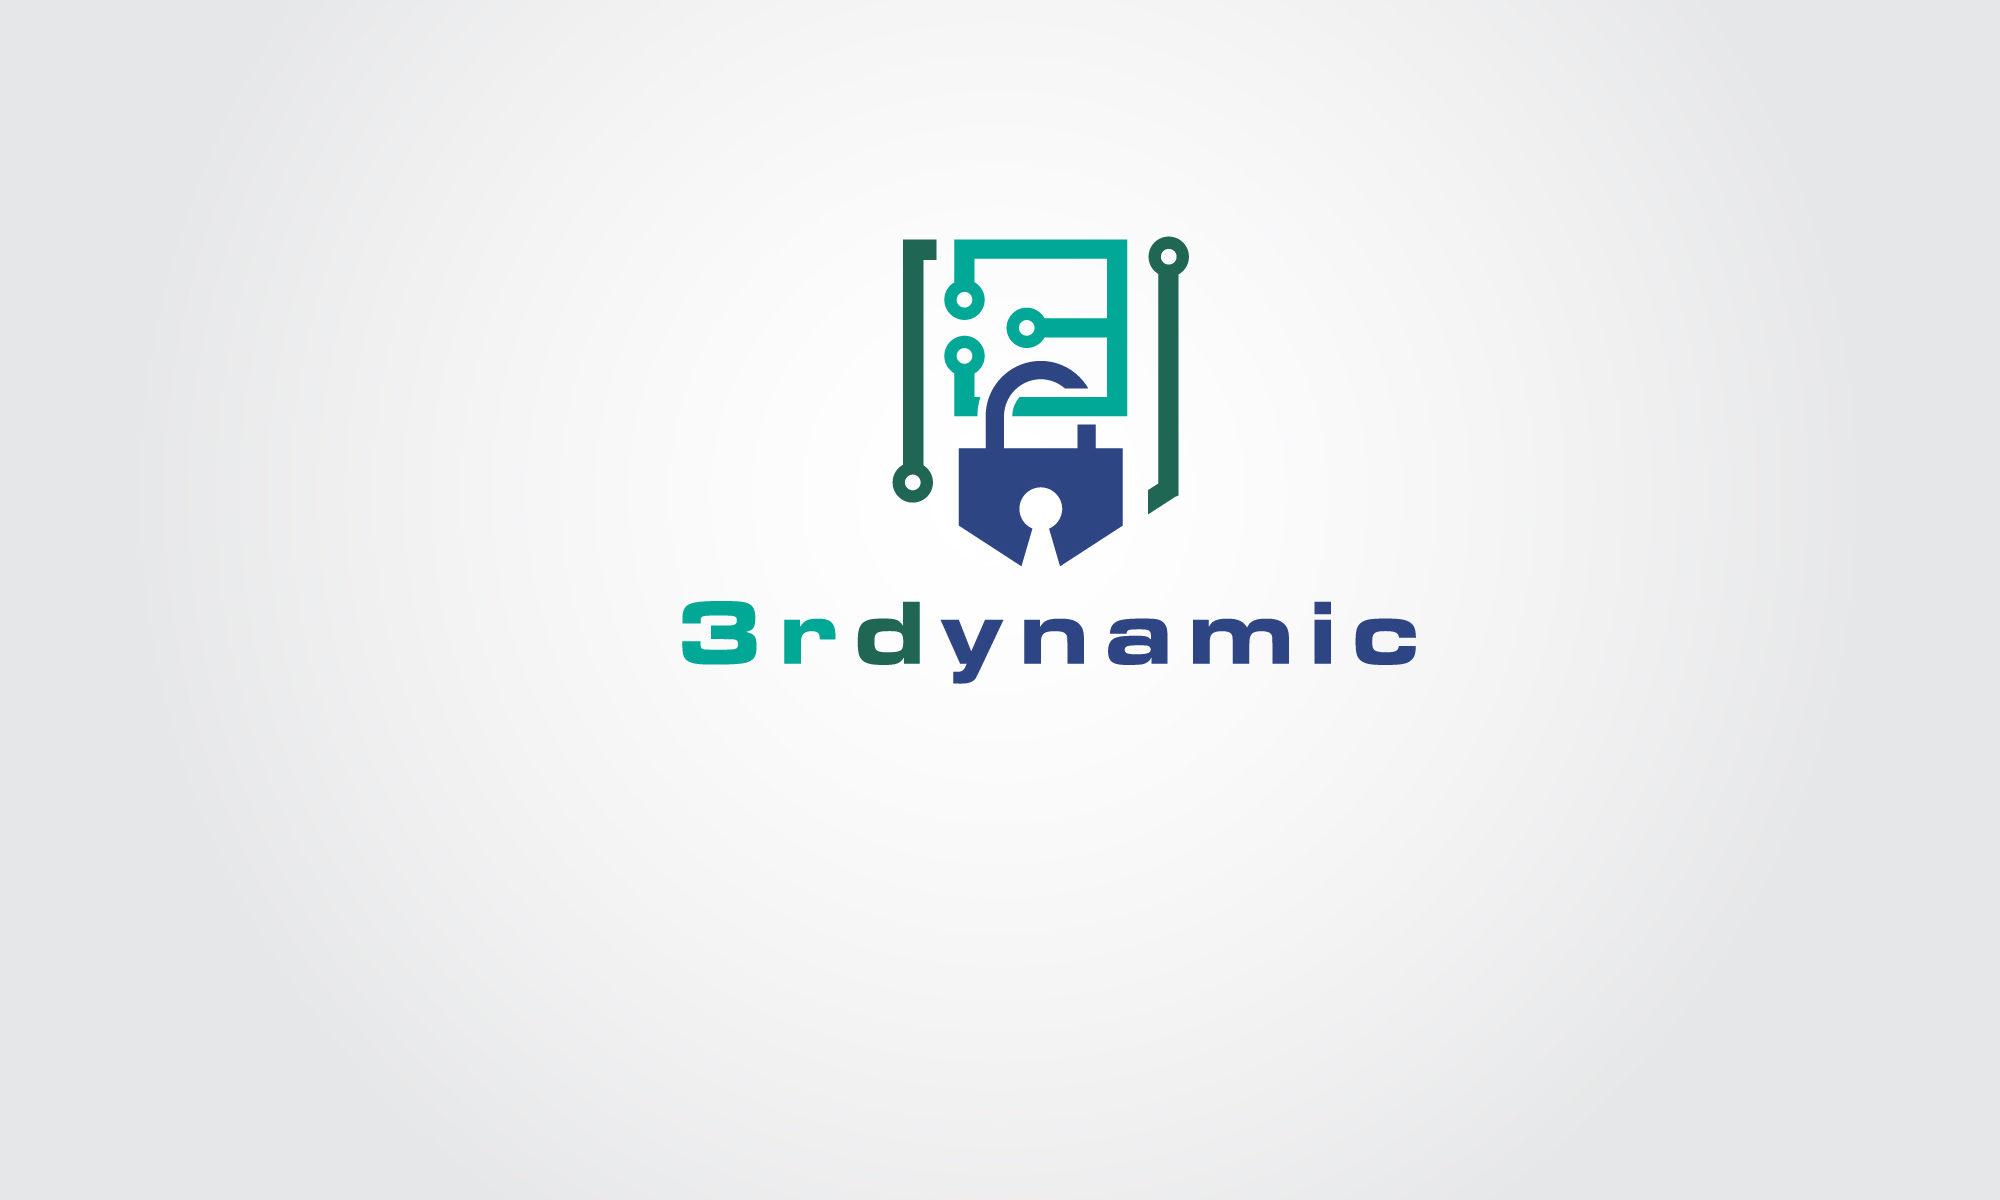 3rdynamic.com